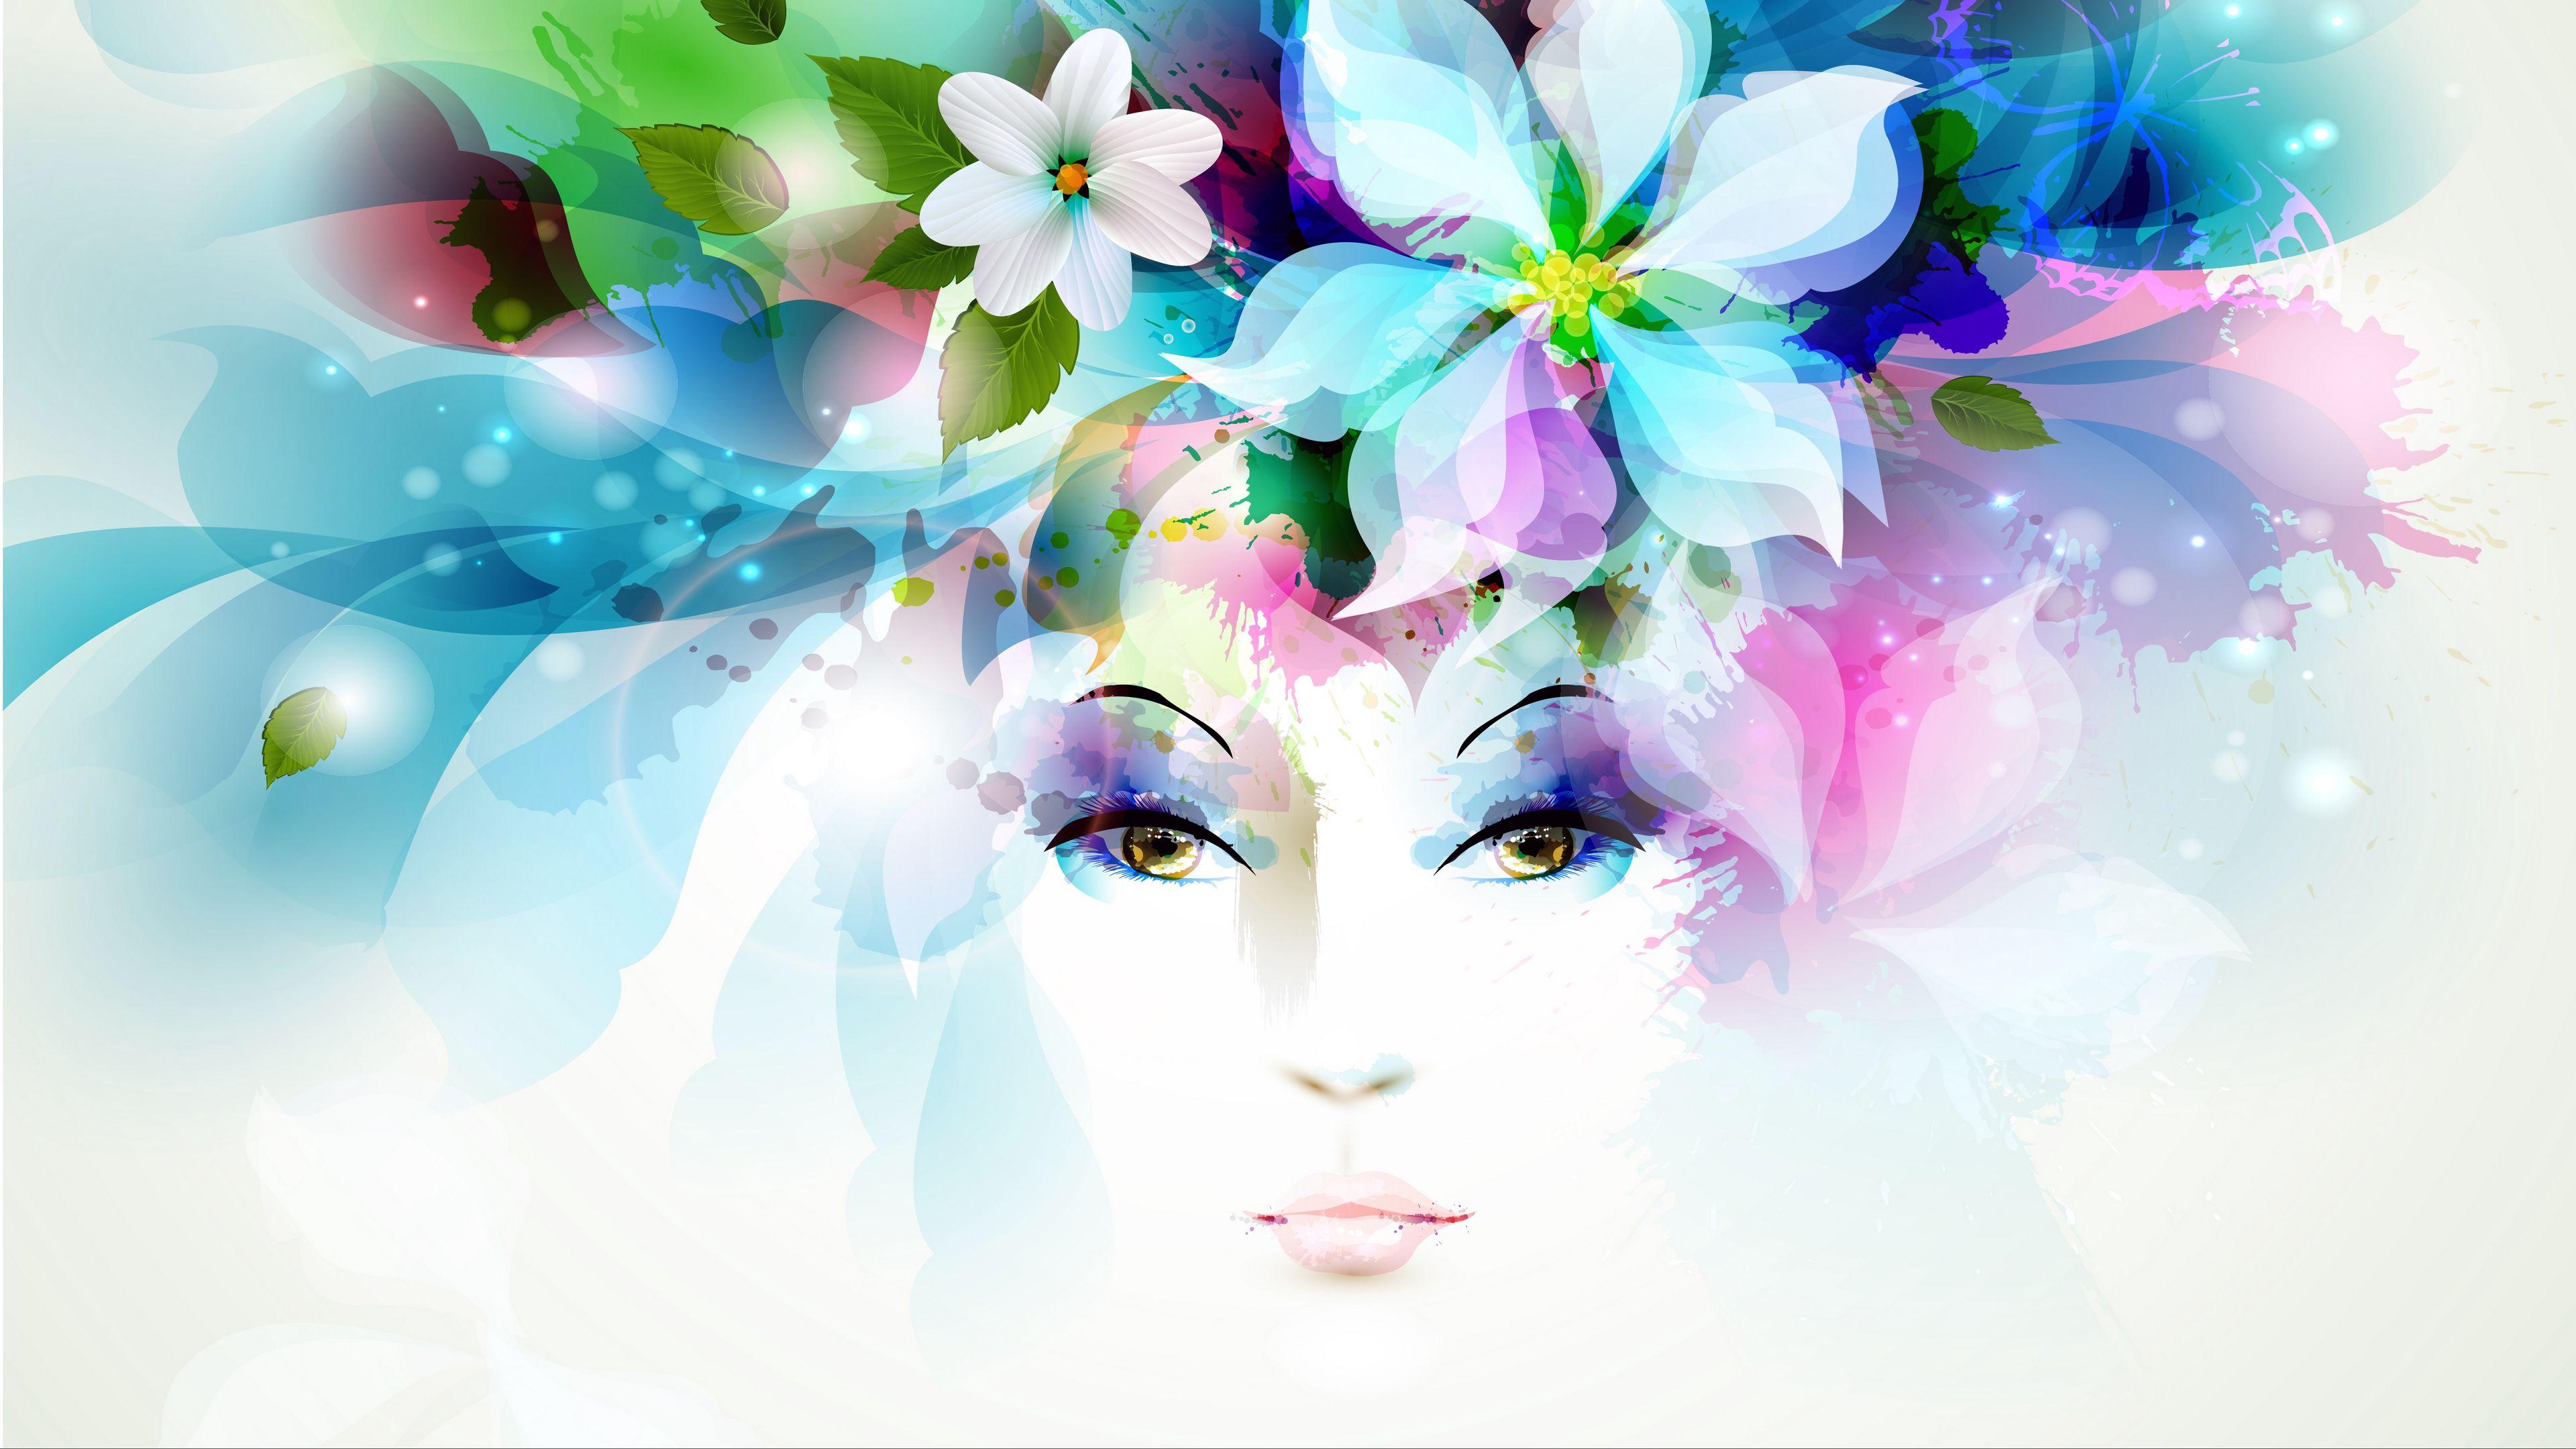 3840x2160 Wallpaper art, girl, eyes, flowers, petals, butterfly, leaves, spray